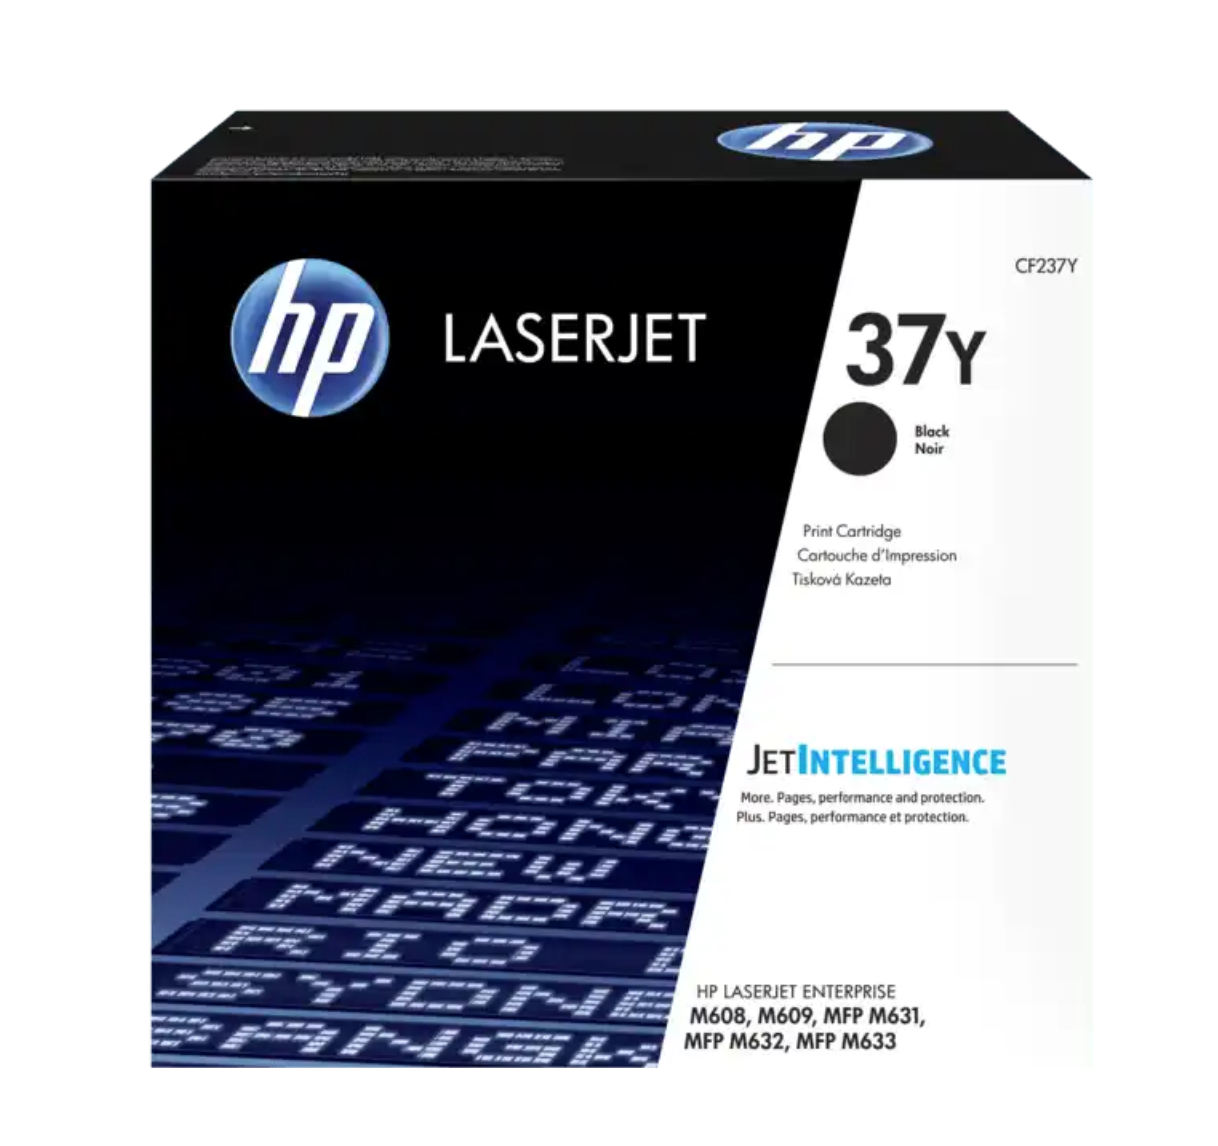 HP 37Y 高打印量黑色原廠 LaserJet 碳粉 CF237Y